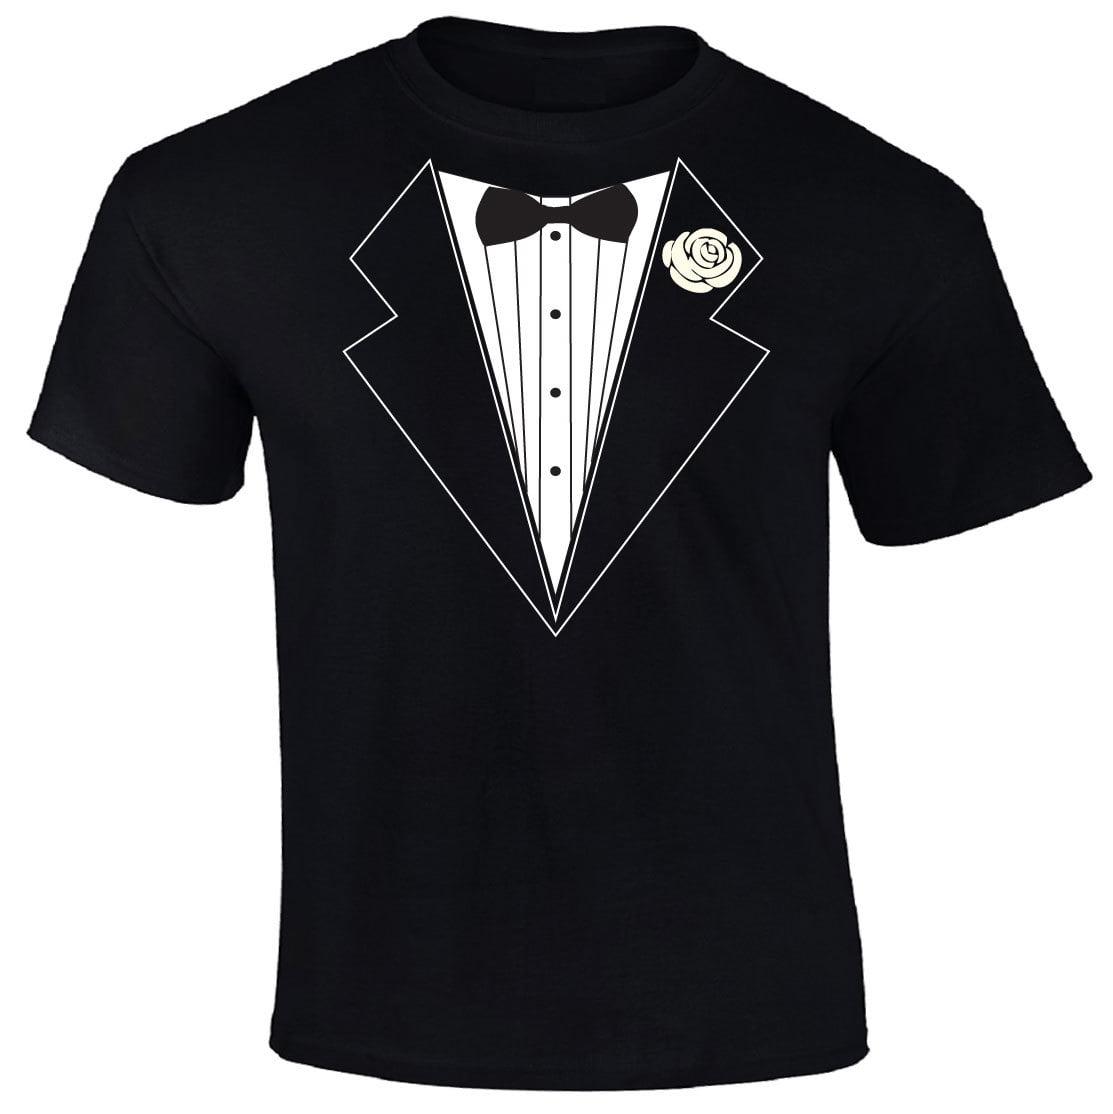 Tuxedo Tux Adult T-Shirt